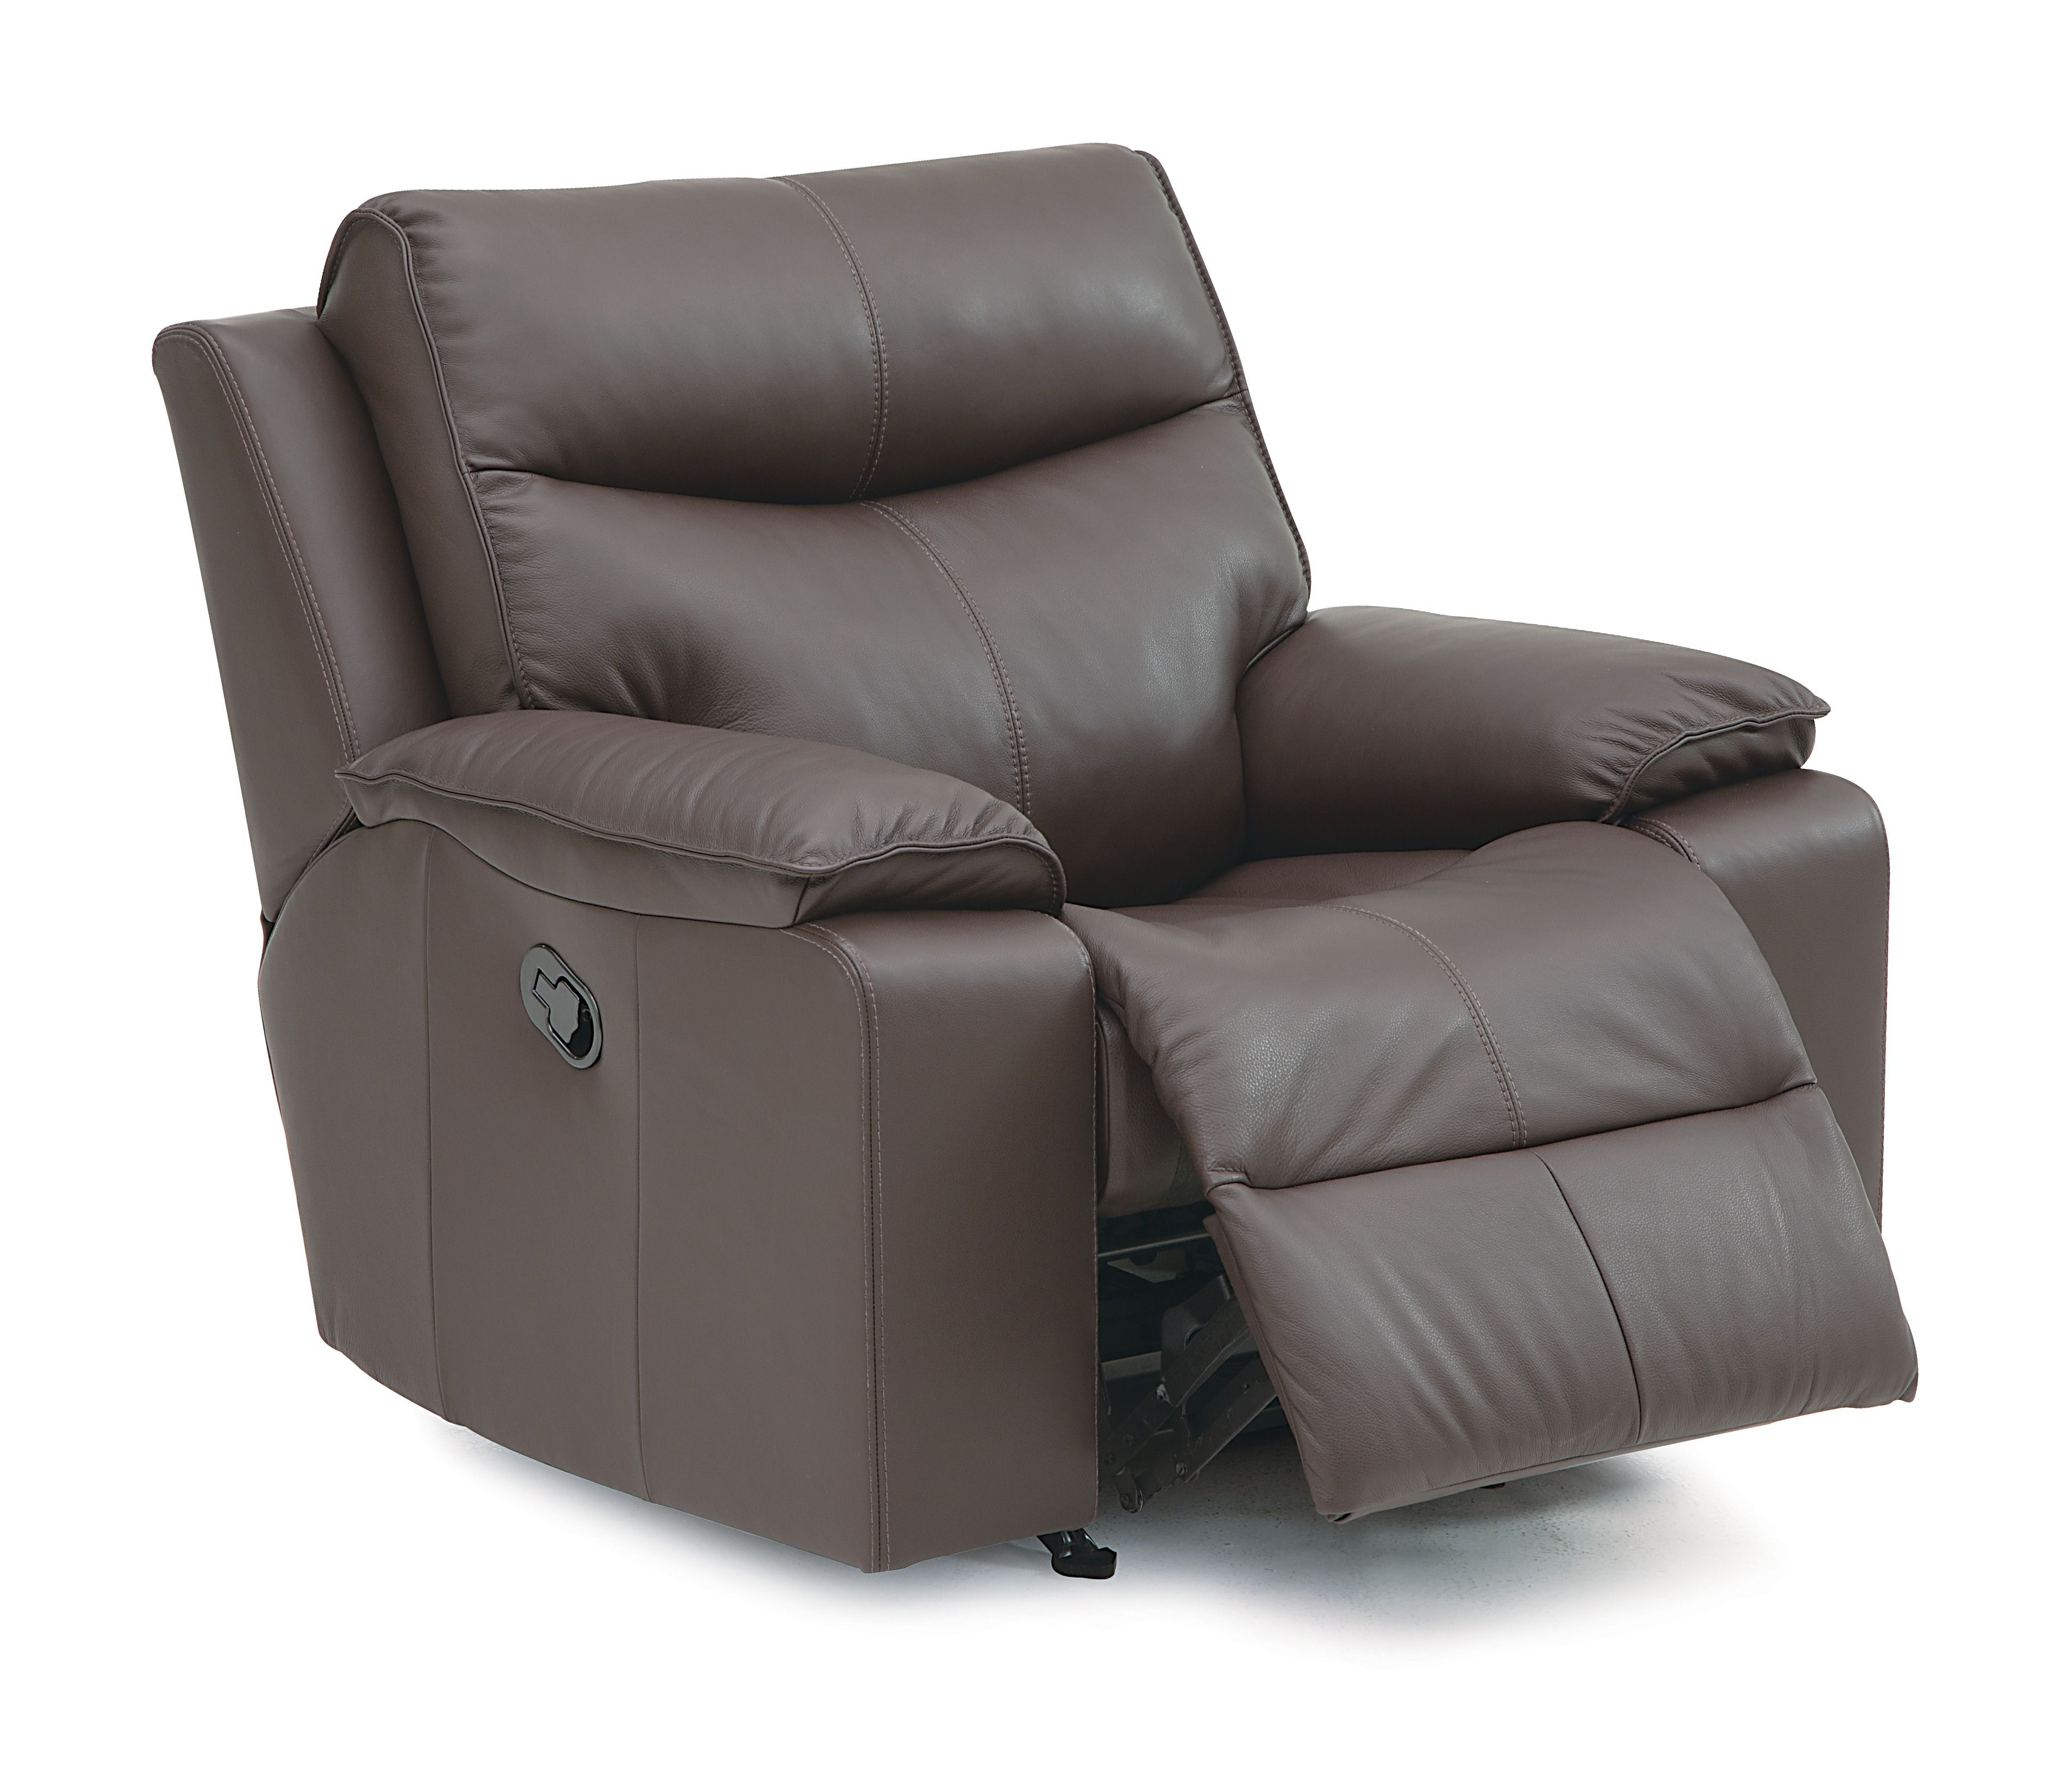 palliser furniture furniture hamilton sofa leather gallery rh hamiltonssofagallery com